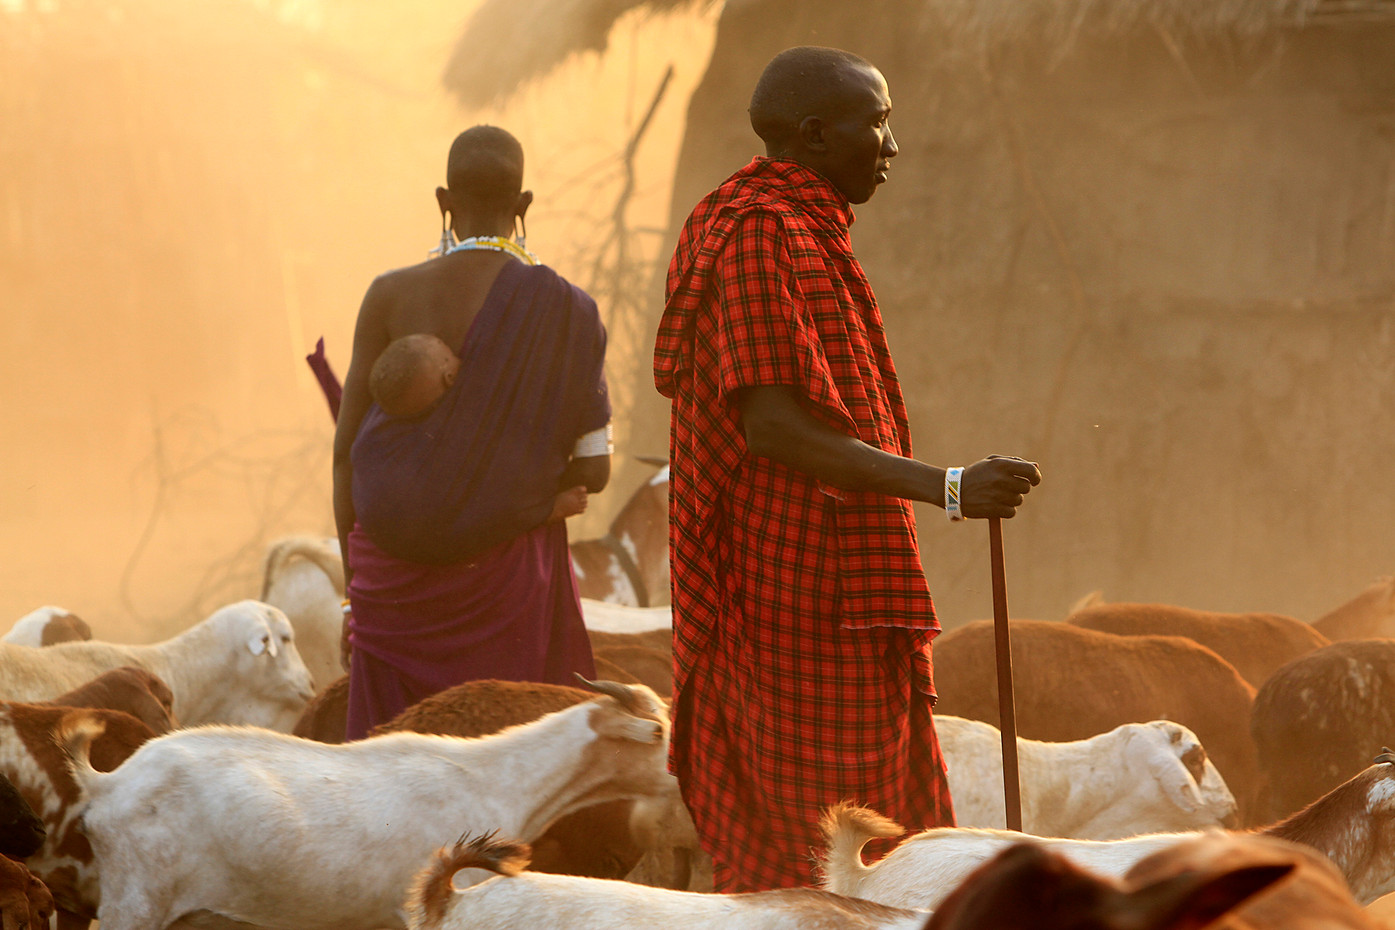 Masai man, woman & baby, Tanzania